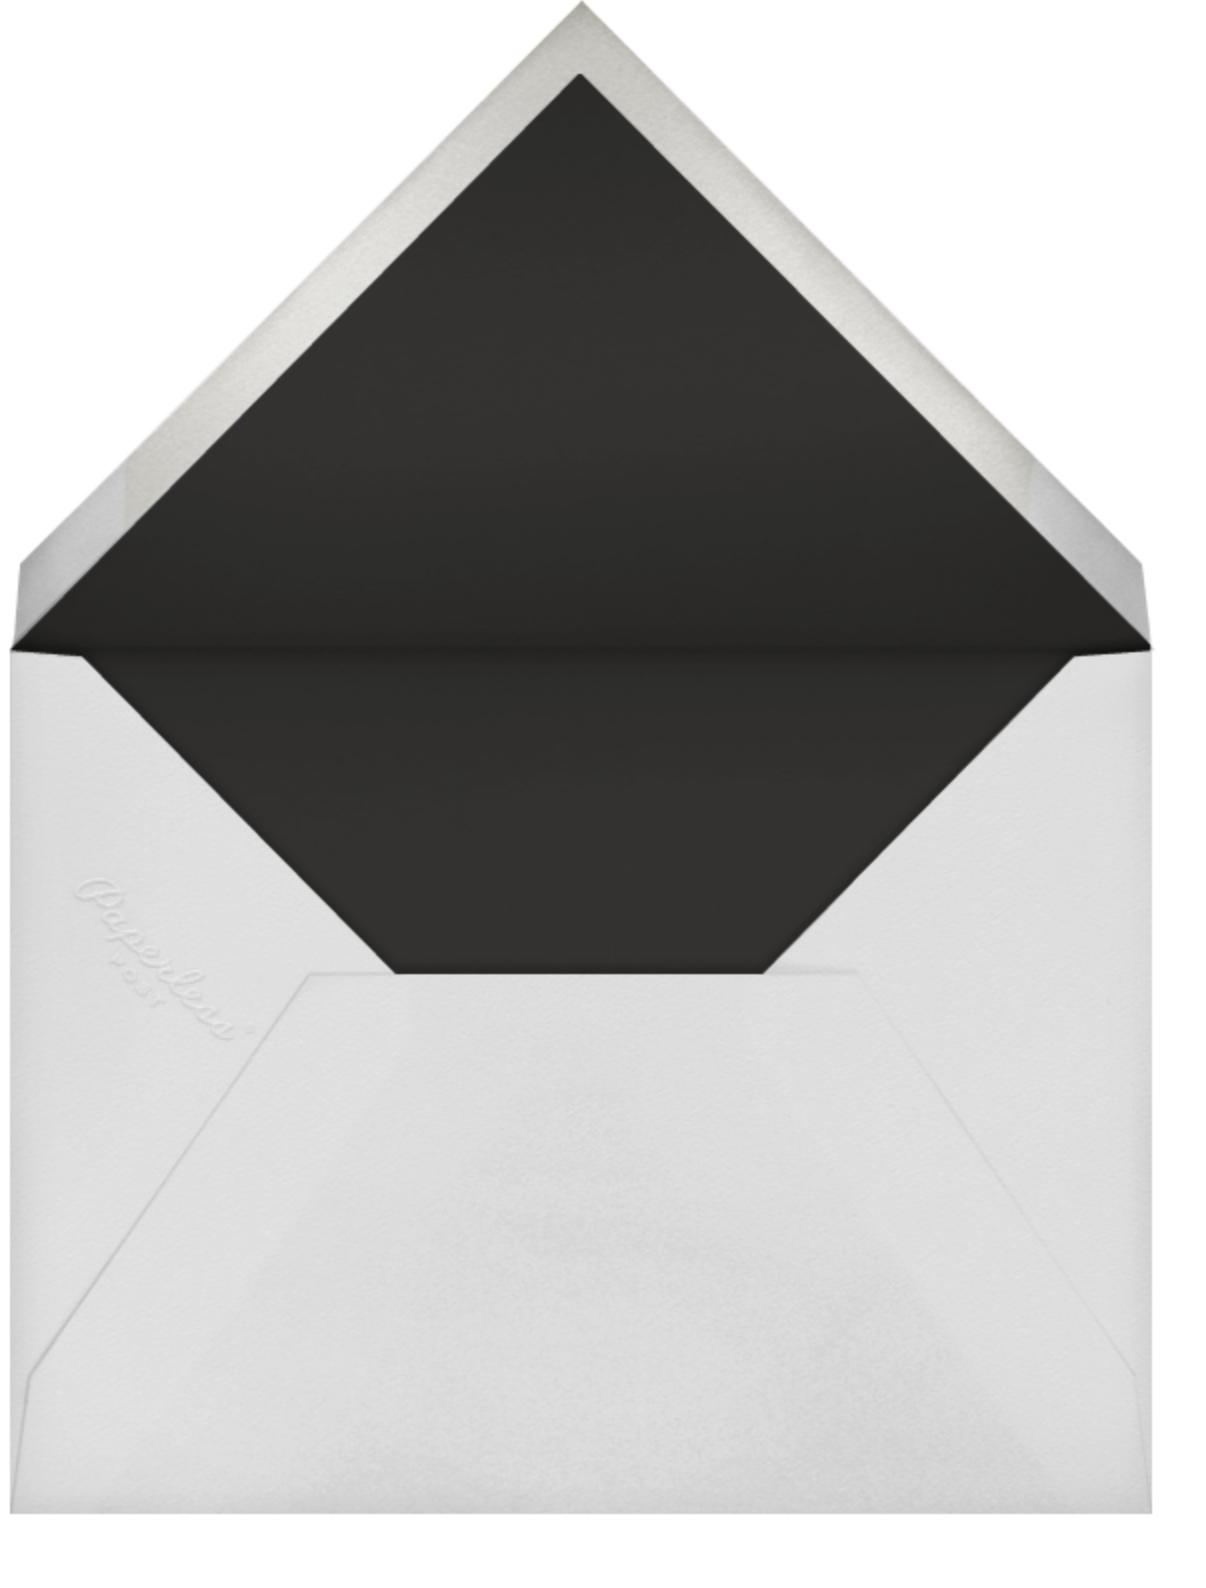 Richmond Park (Stationery) - White/Silver - Oscar de la Renta - Wedding - envelope back